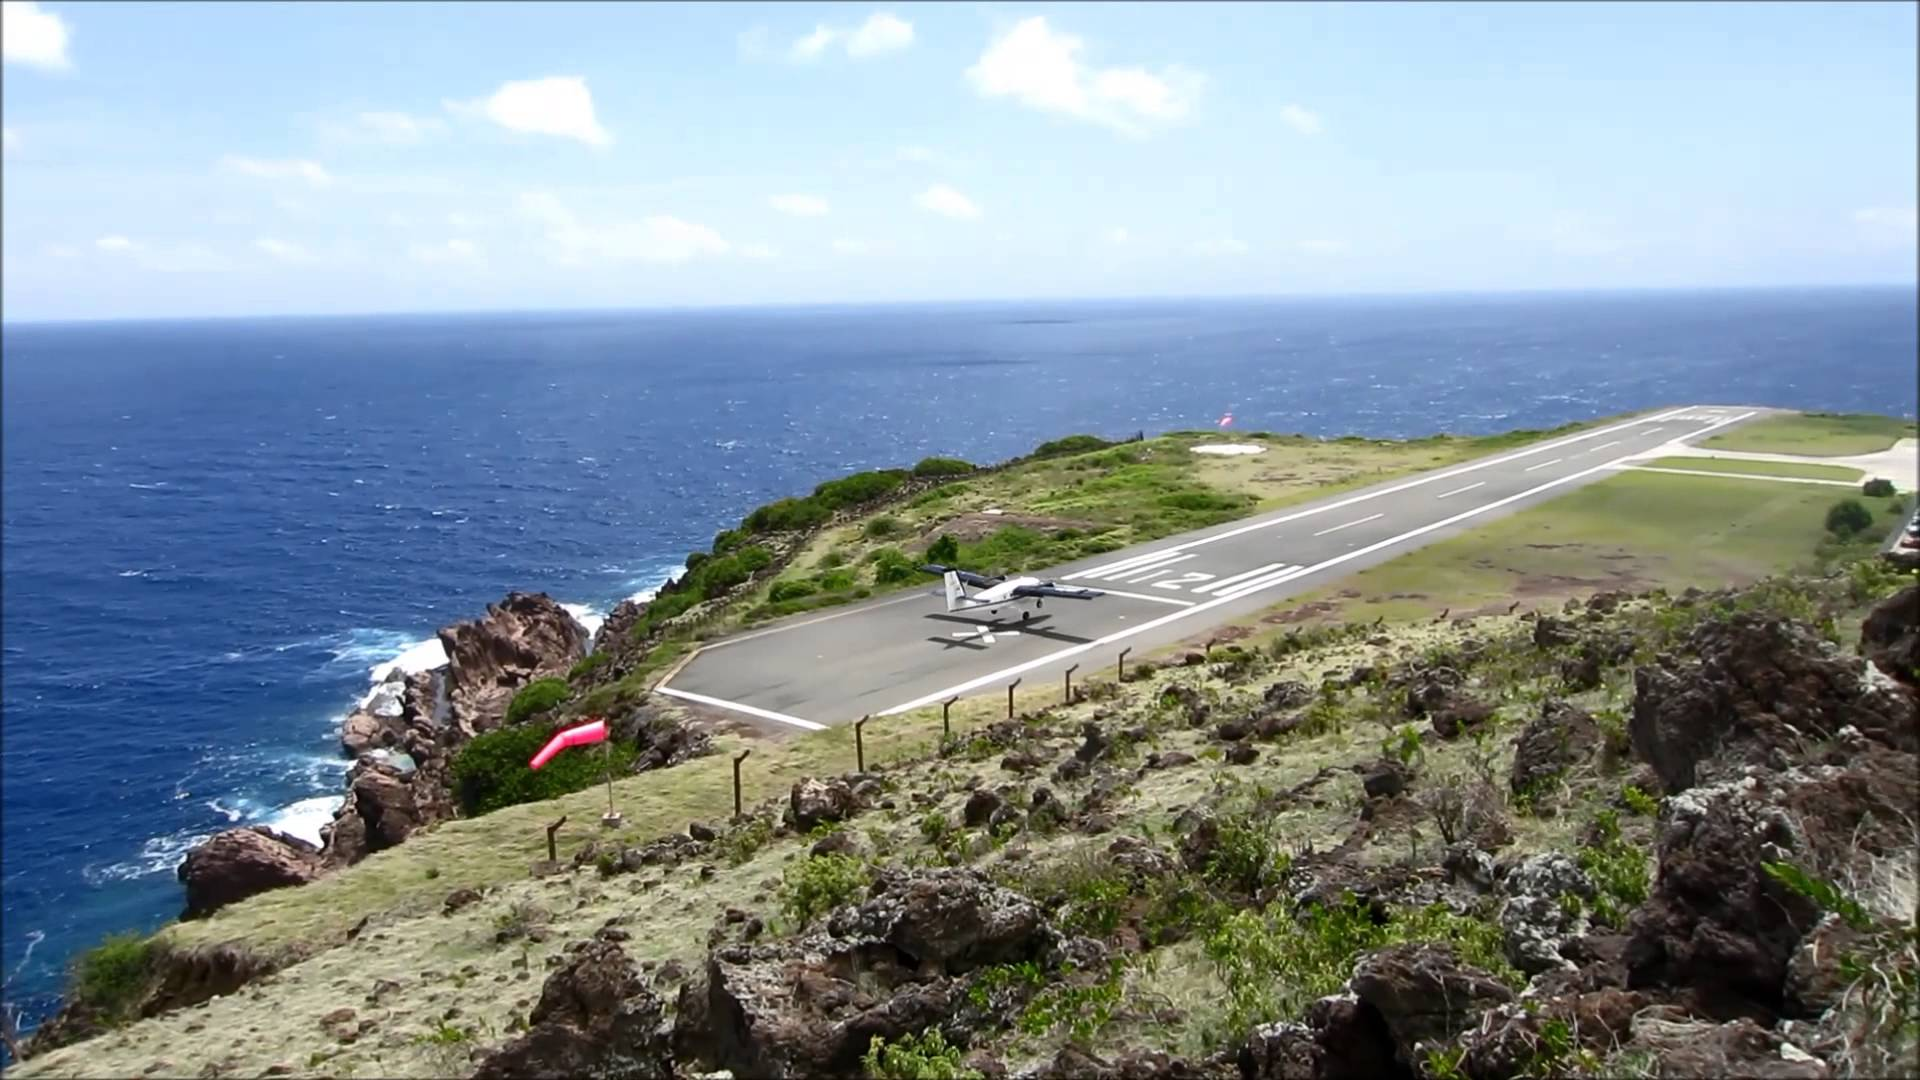 Аэропорт Хуанчо-Ираускин, остров Саба